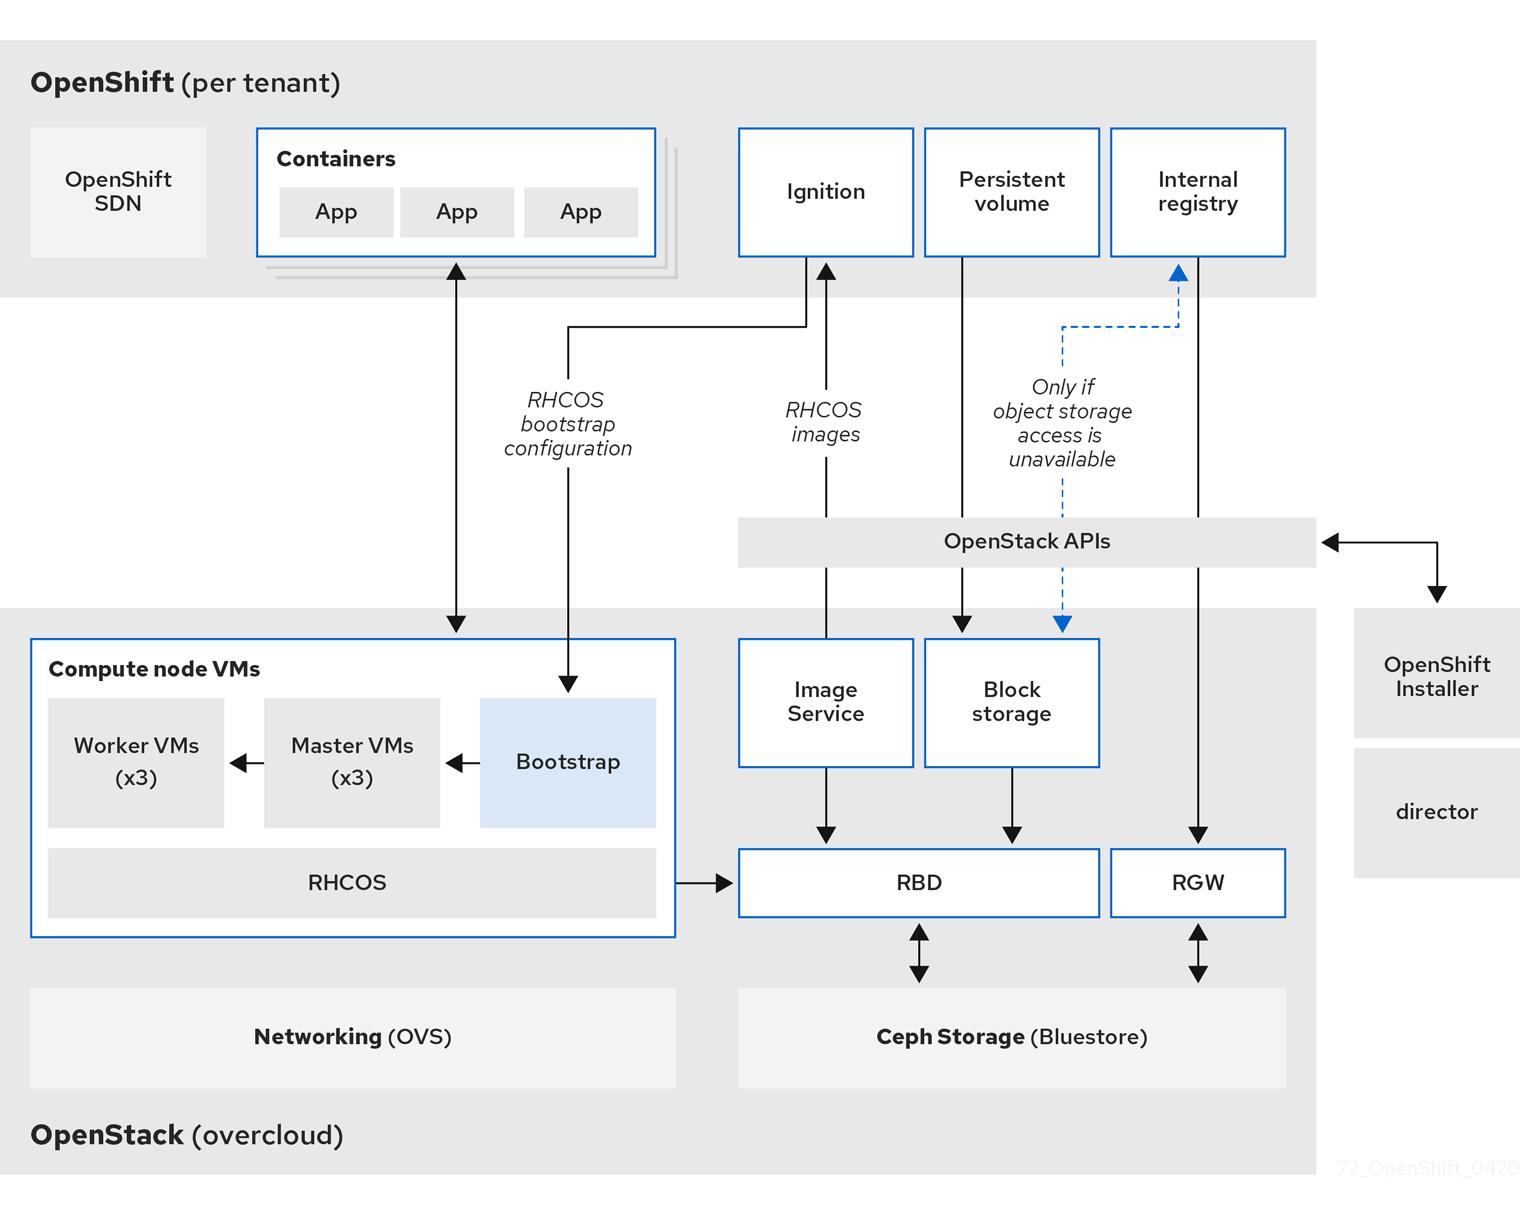 OCP 4 on OSP RA Blog Post